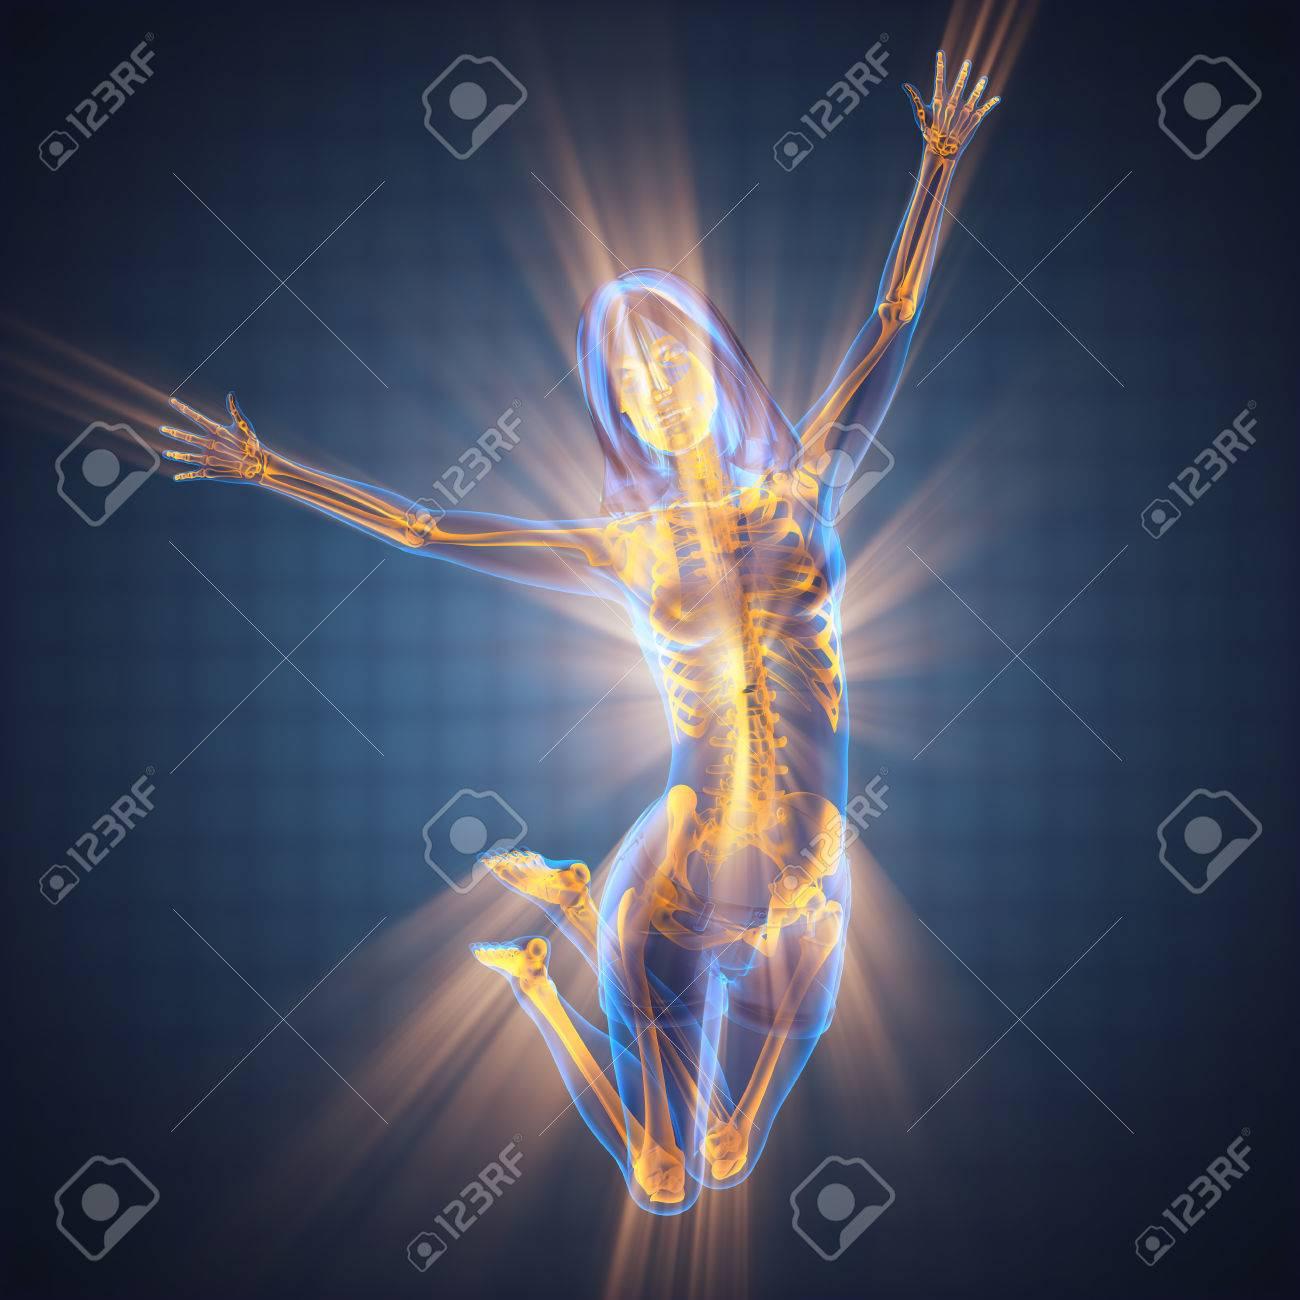 woman bones radiography scan image - 47966437